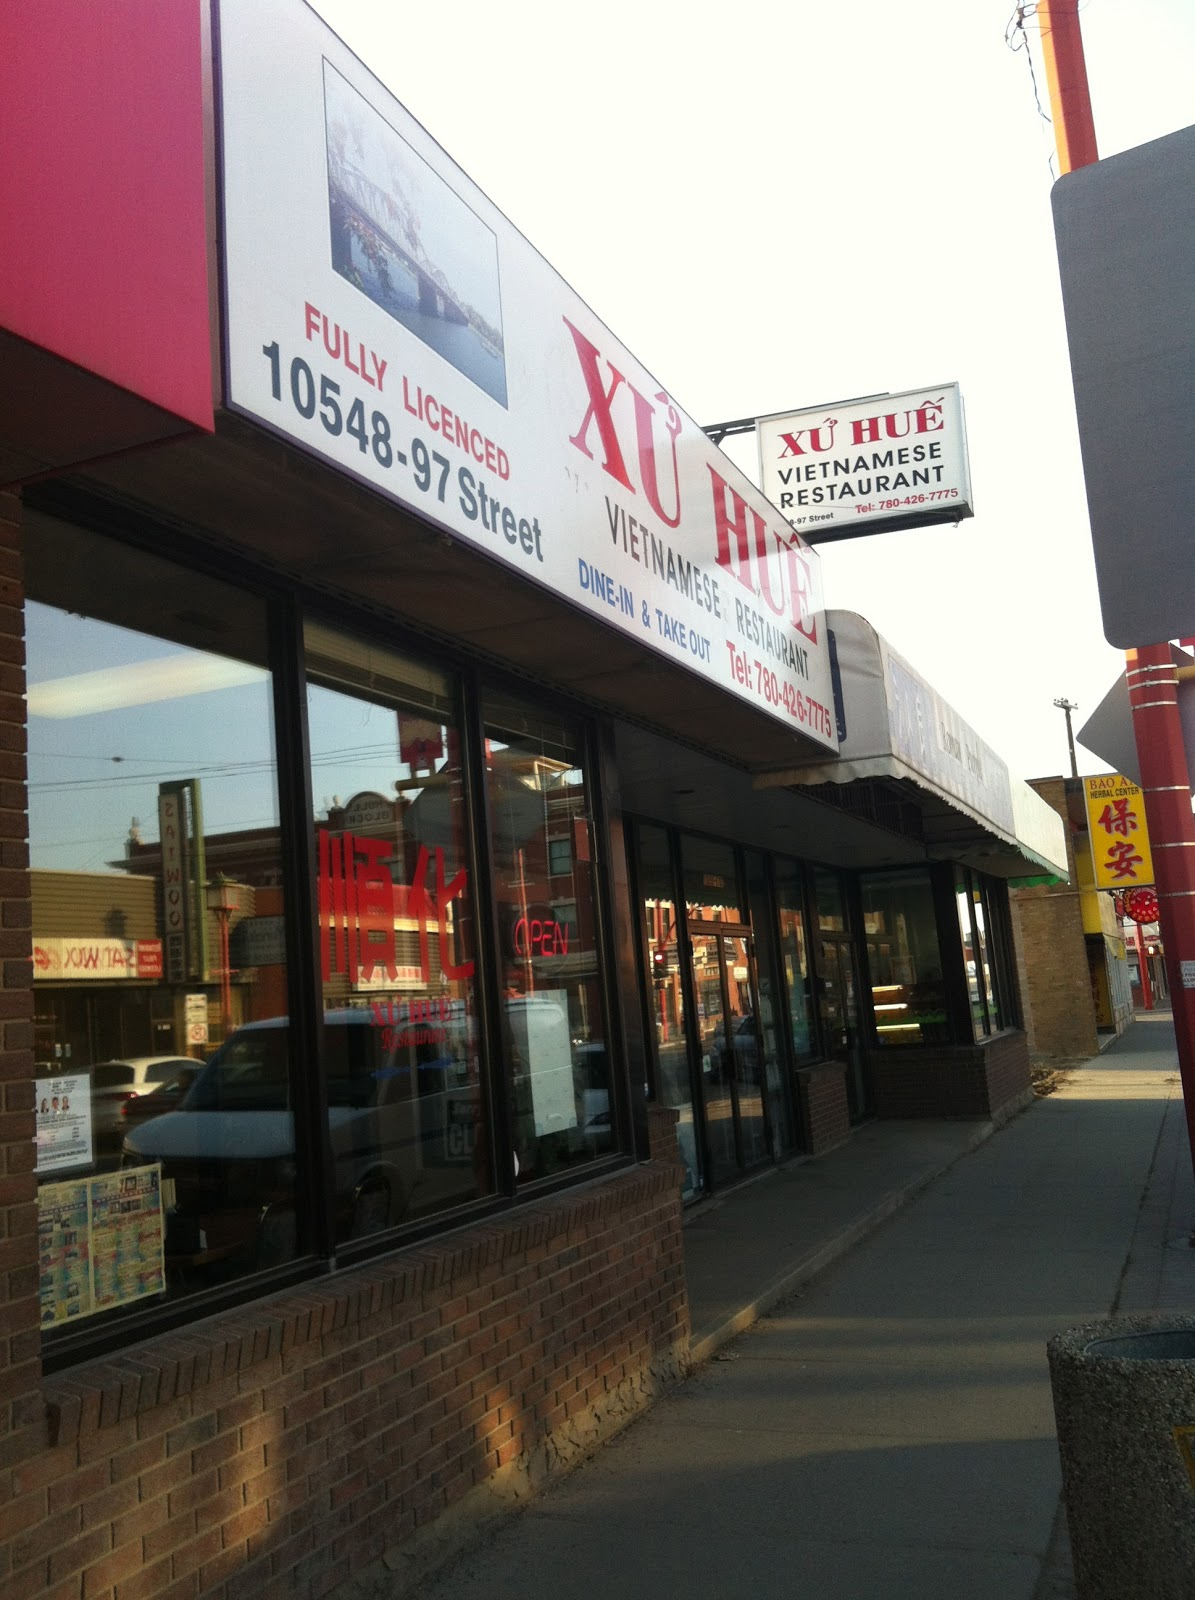 Edmonton: All Eric Can Eat: Xu Hue Vietnamese Restaurant